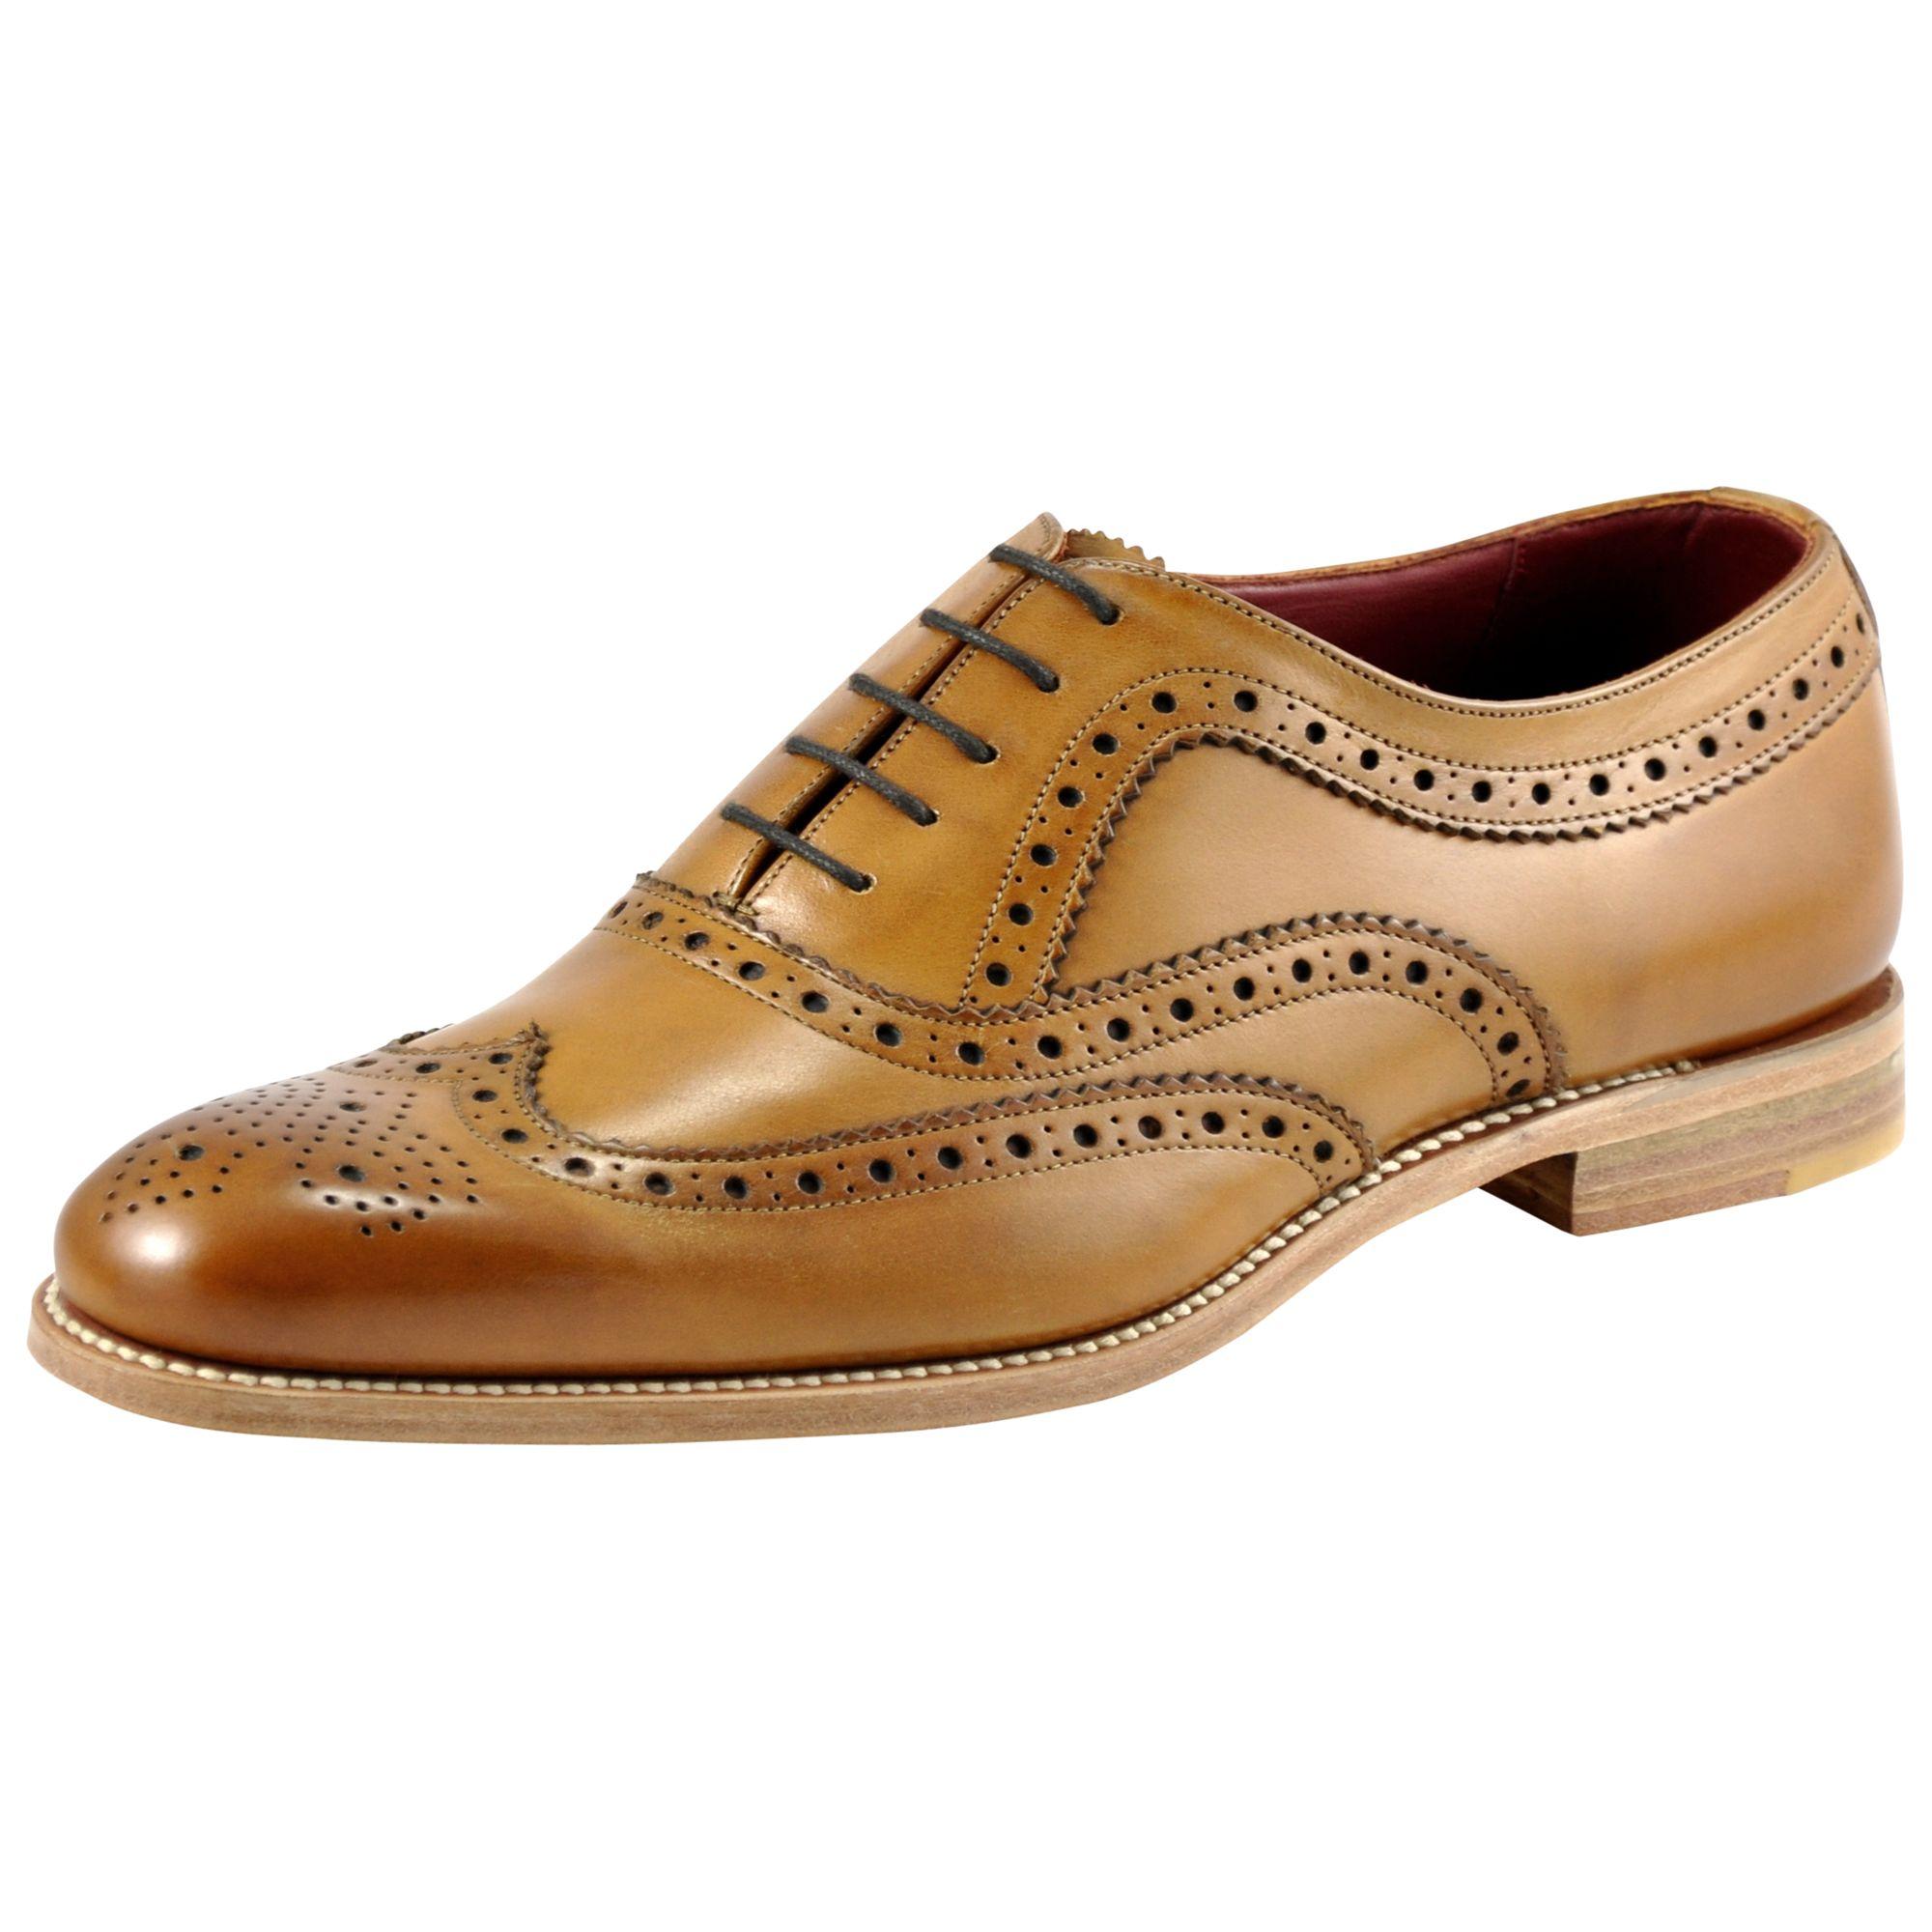 Loake Loake Fearnley Brogue Oxford Shoes, Tan